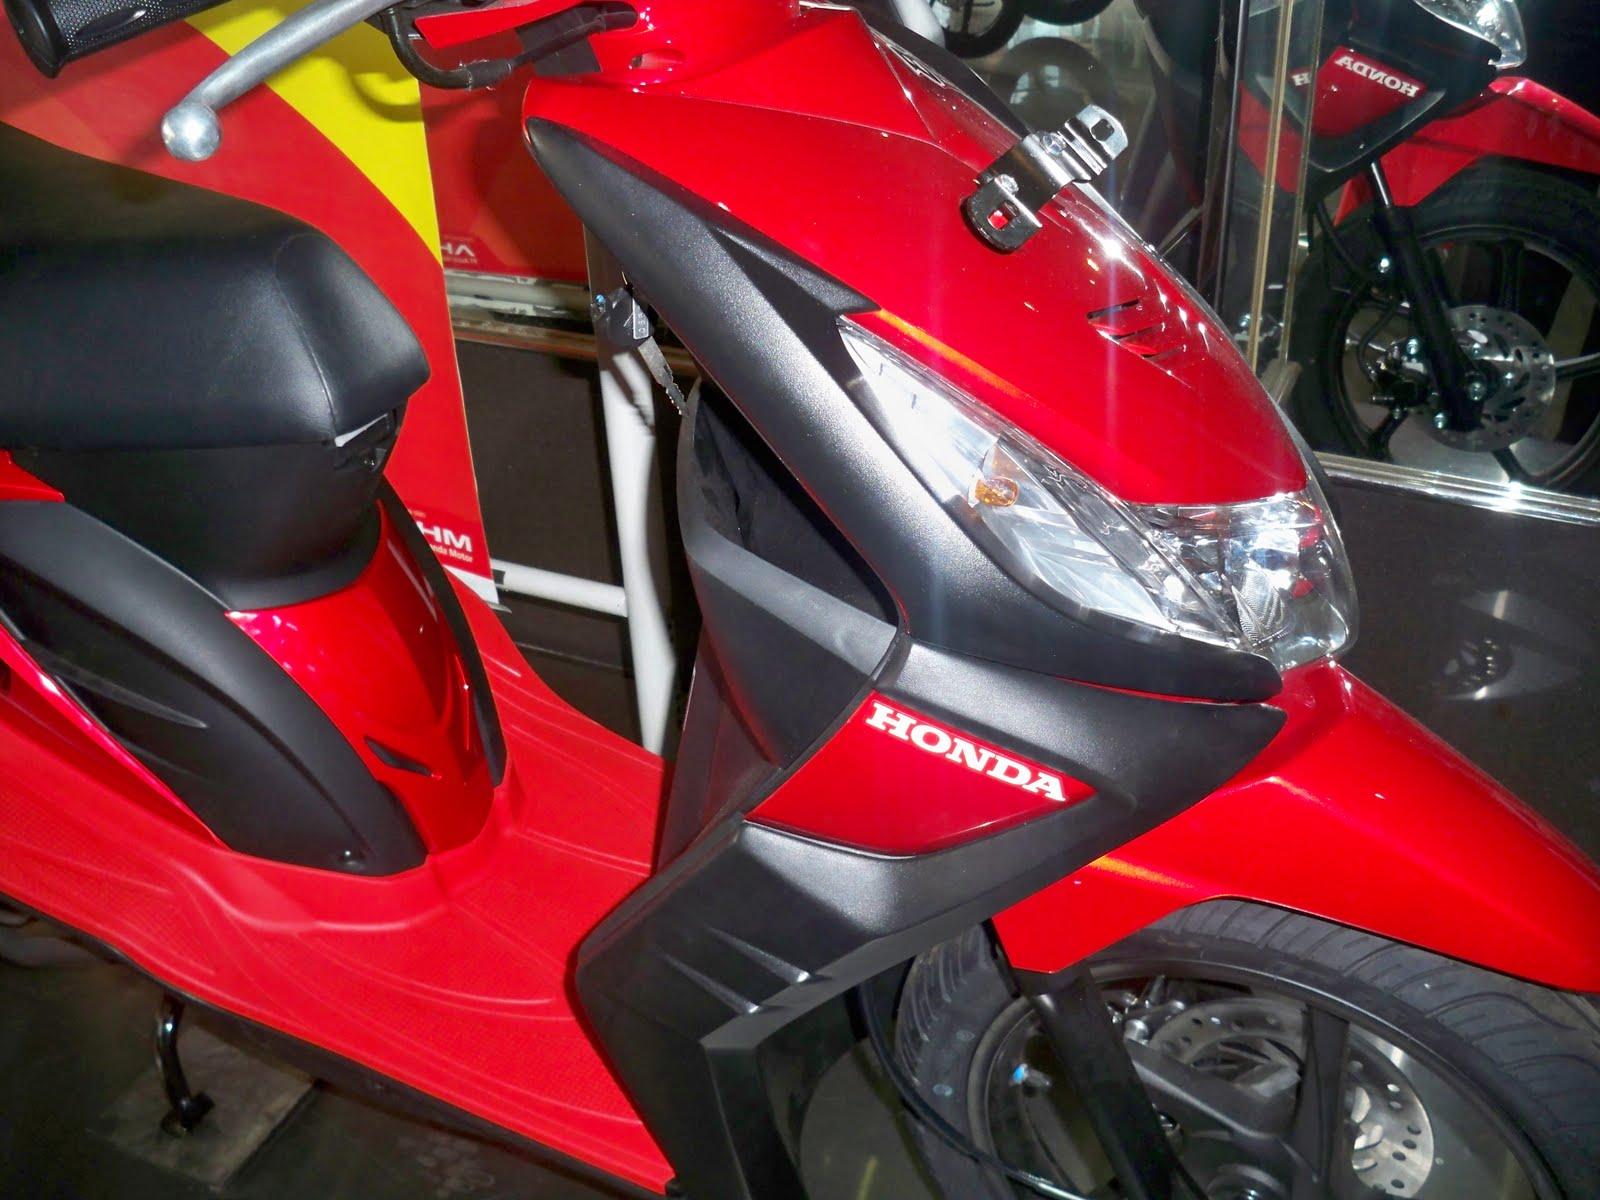 Aksesoris Modifikasi Motor Honda Beat Terupdate Klobot Modif